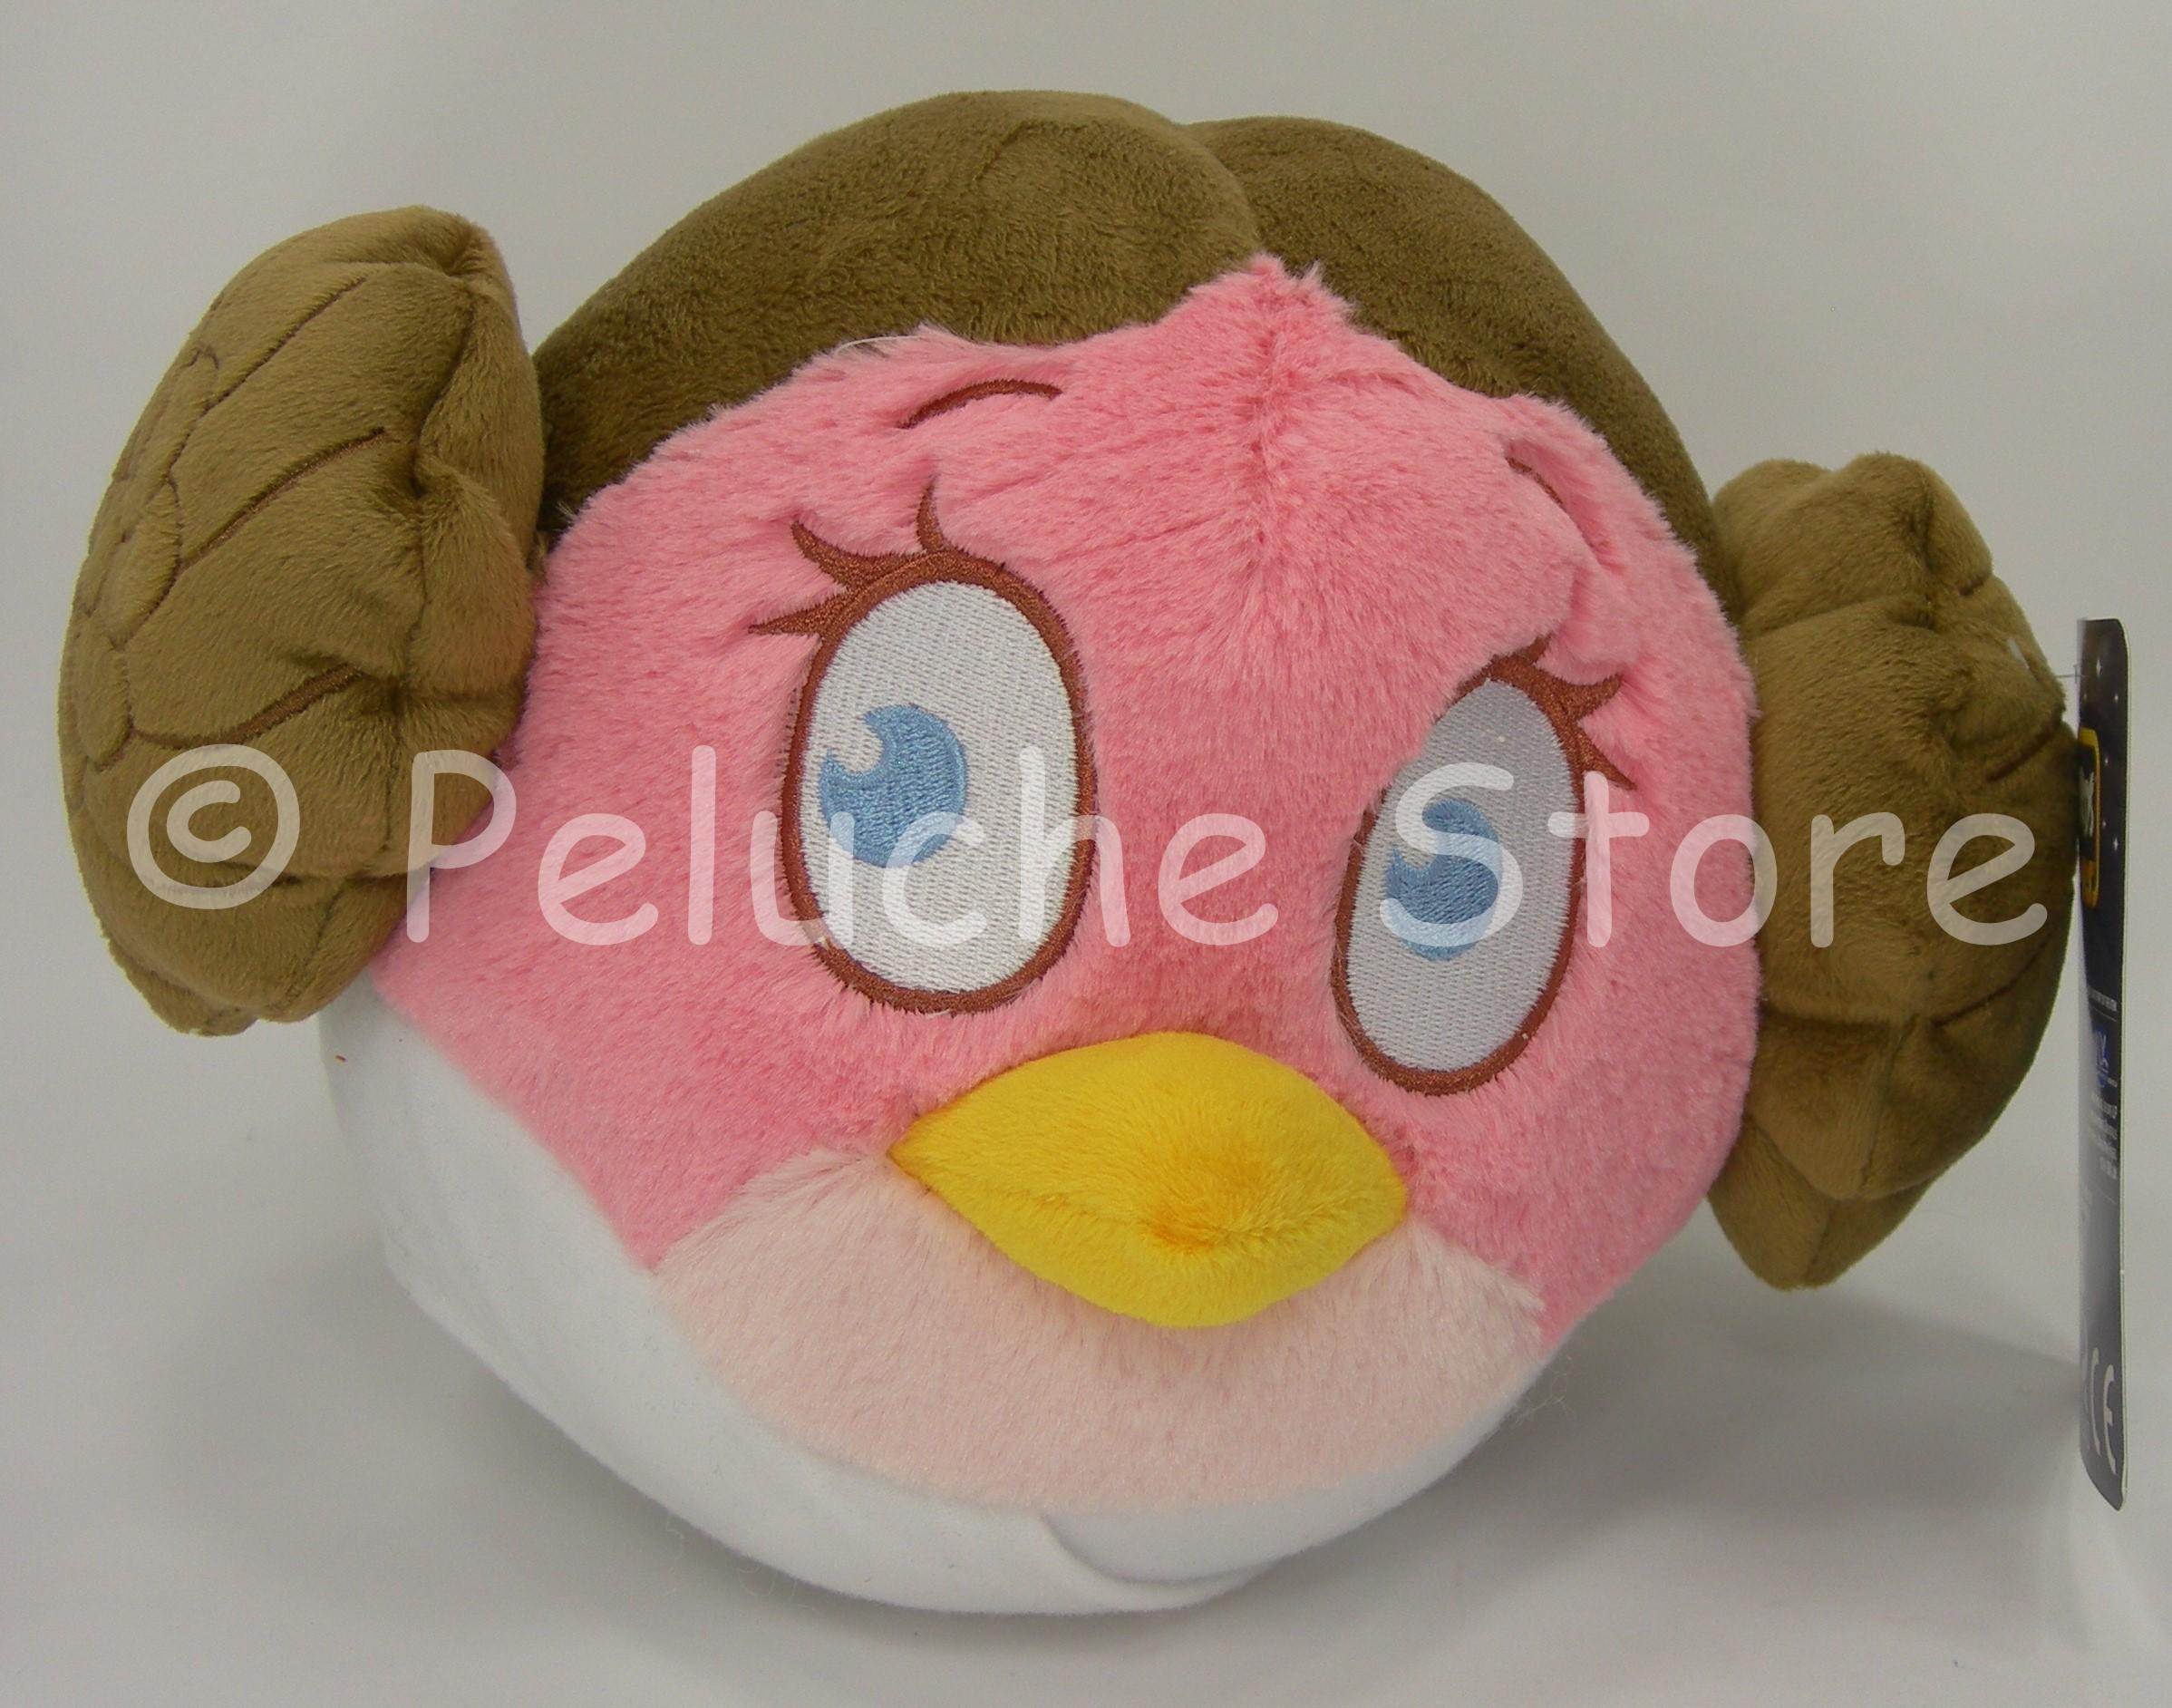 Angry Birds Star Wars Principessa Leia peluche 30 cm velluto